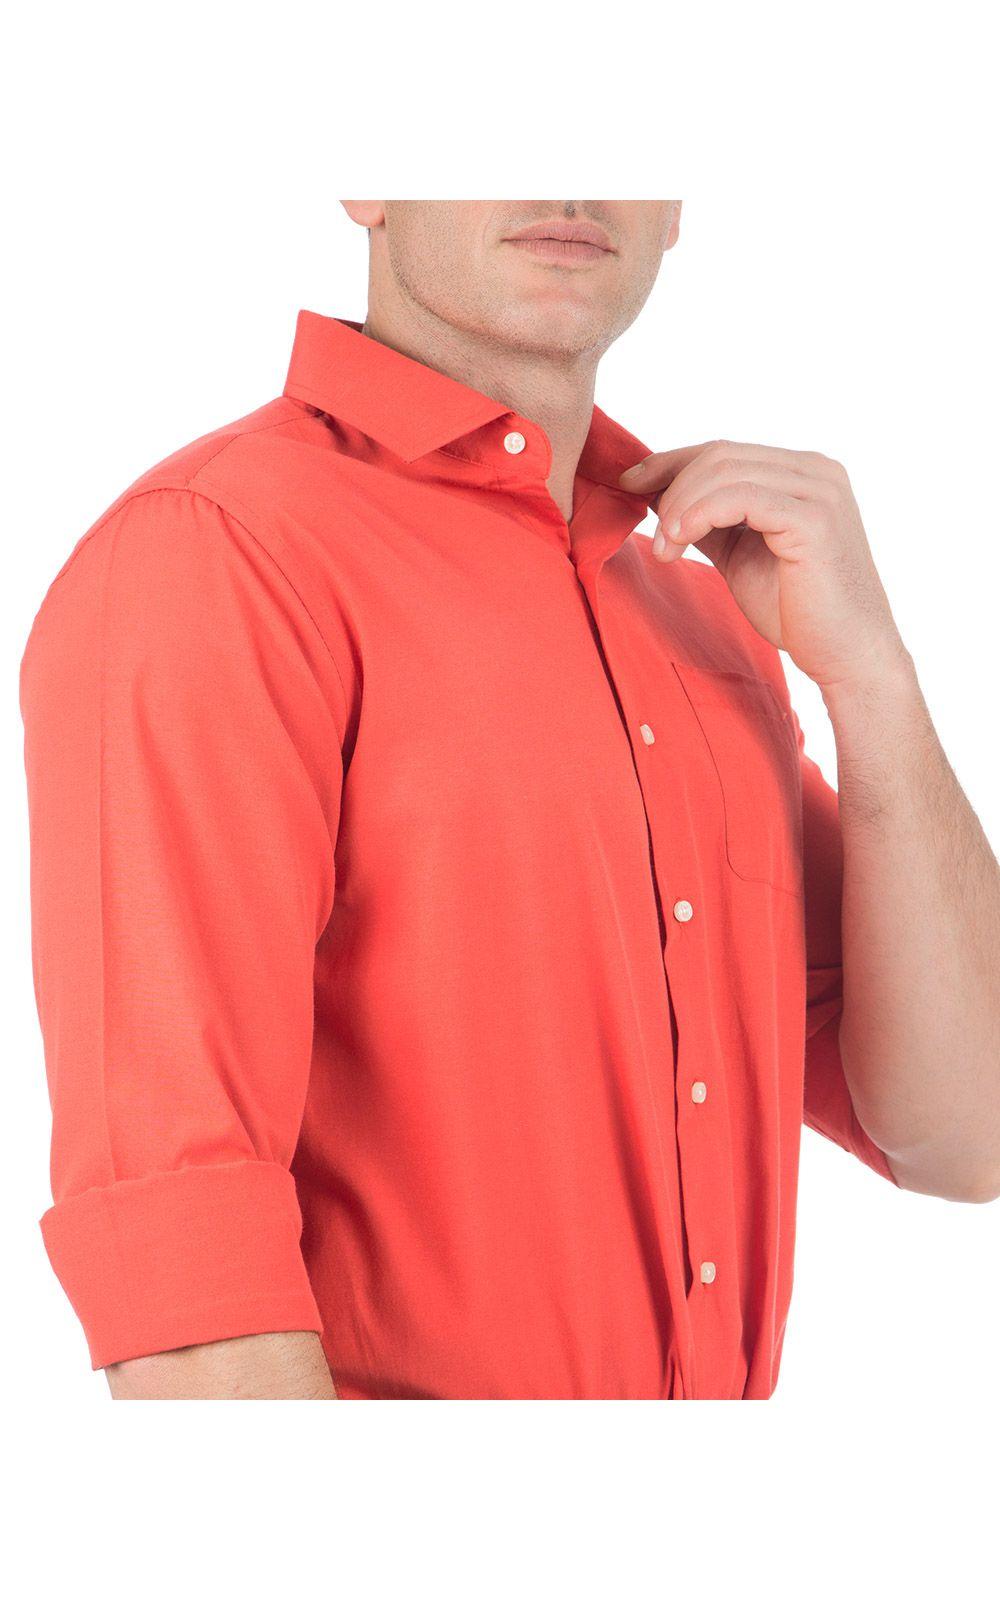 Foto 3 - Camisa Social Masculina Laranja Lisa